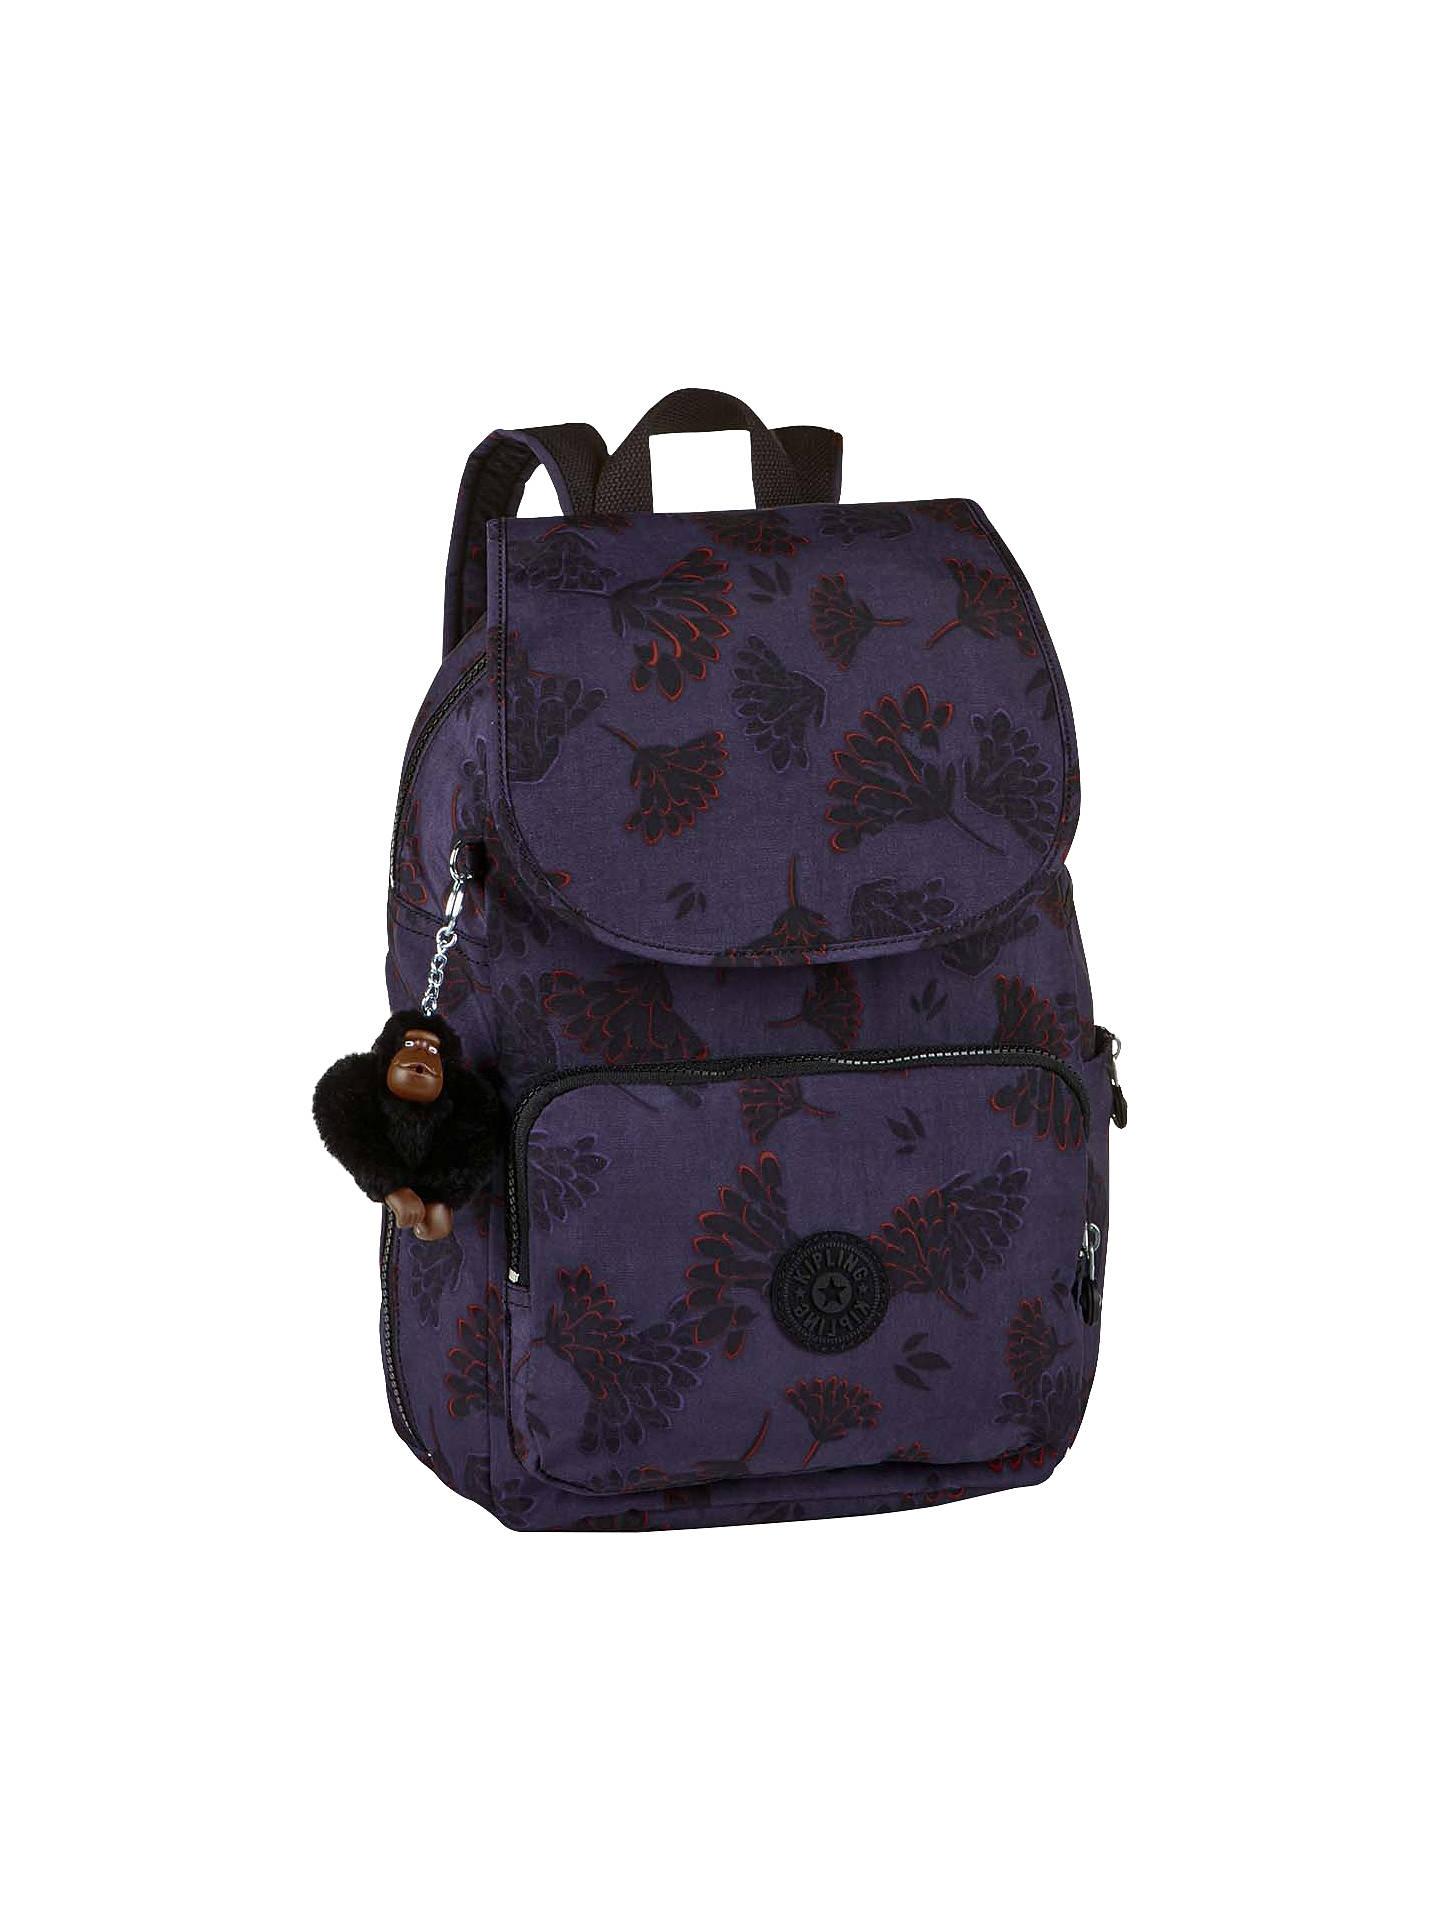 4315316c4 Kipling Mini Backpack Blue- Fenix Toulouse Handball